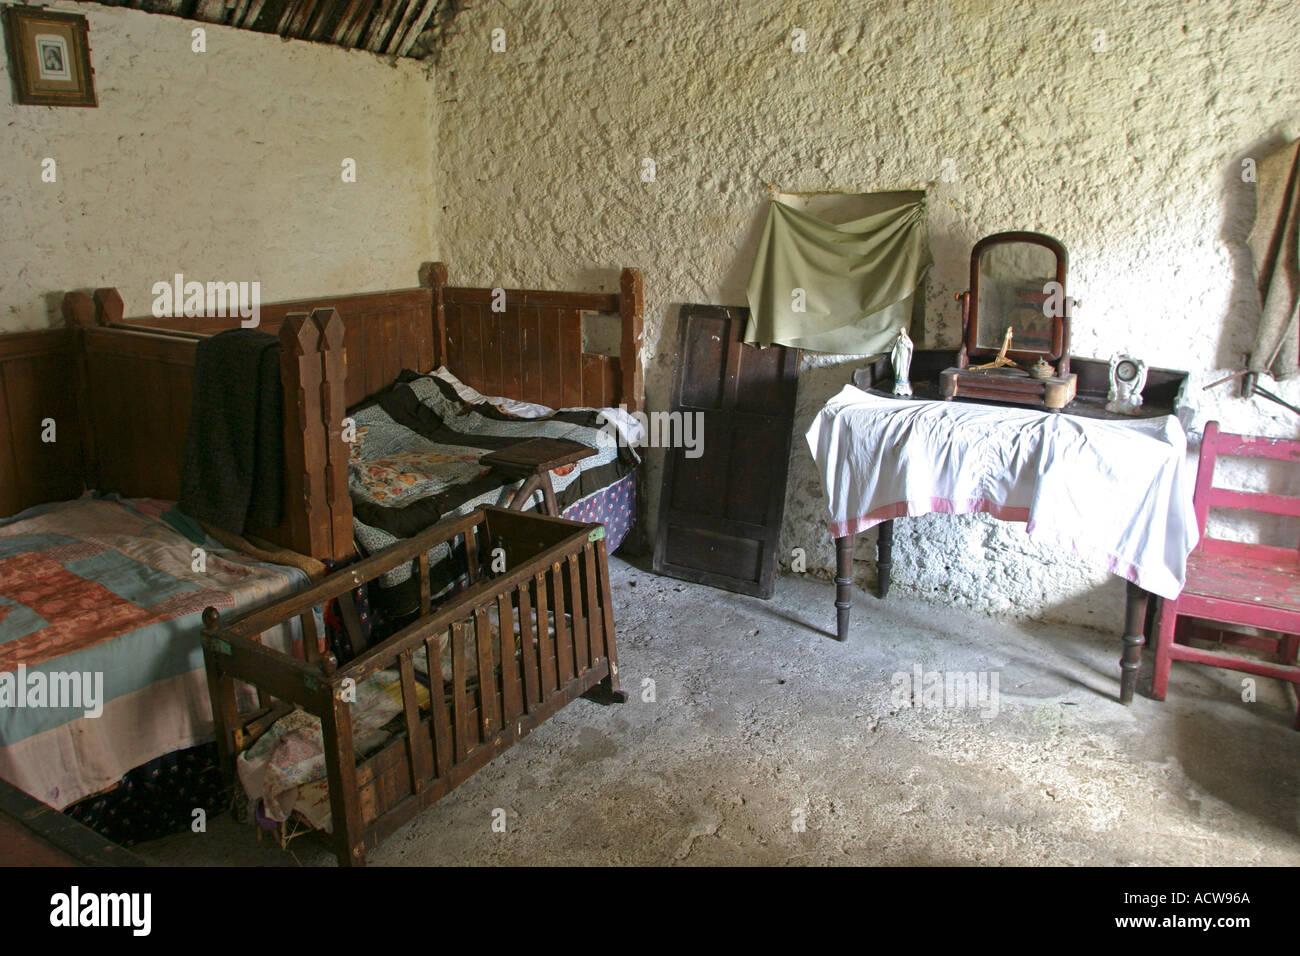 Ireland County Donegal Glencolmcille Folk Village 1800s